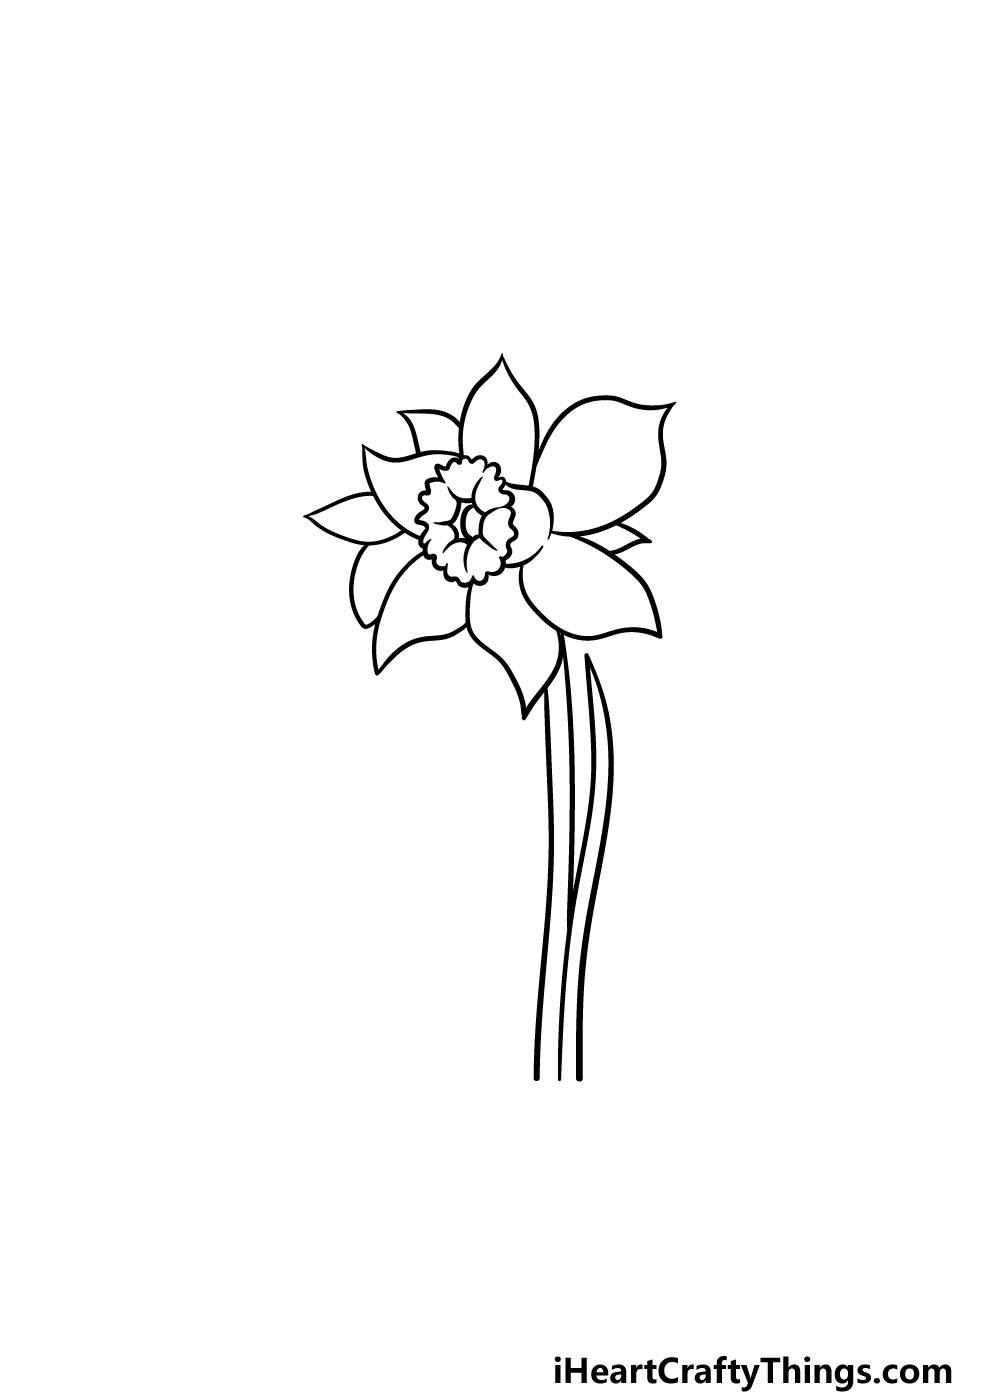 drawing a daffodil step 4